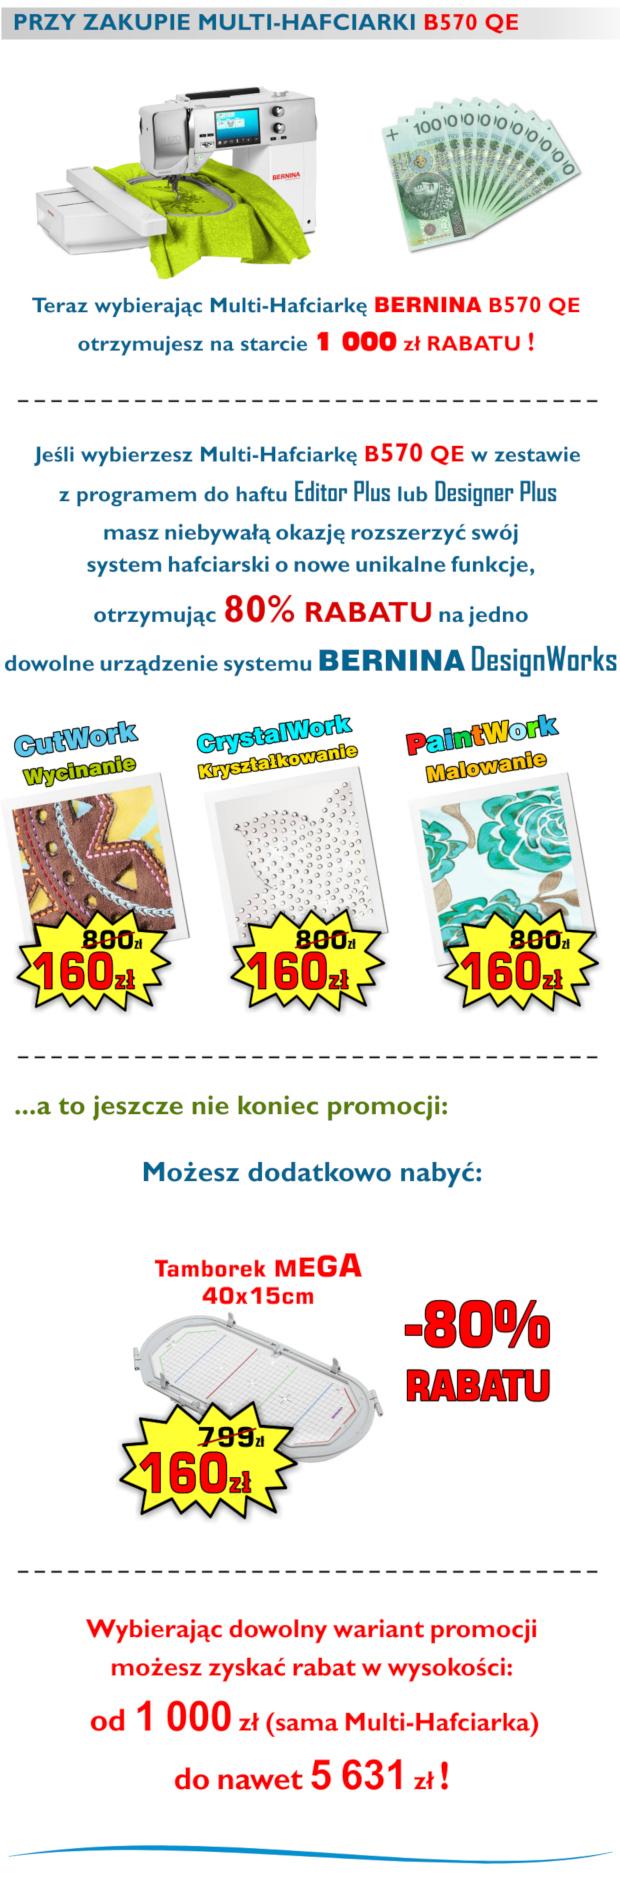 Promocje, super ceny, super rabaty i gratisy - hafciarki BERNINA